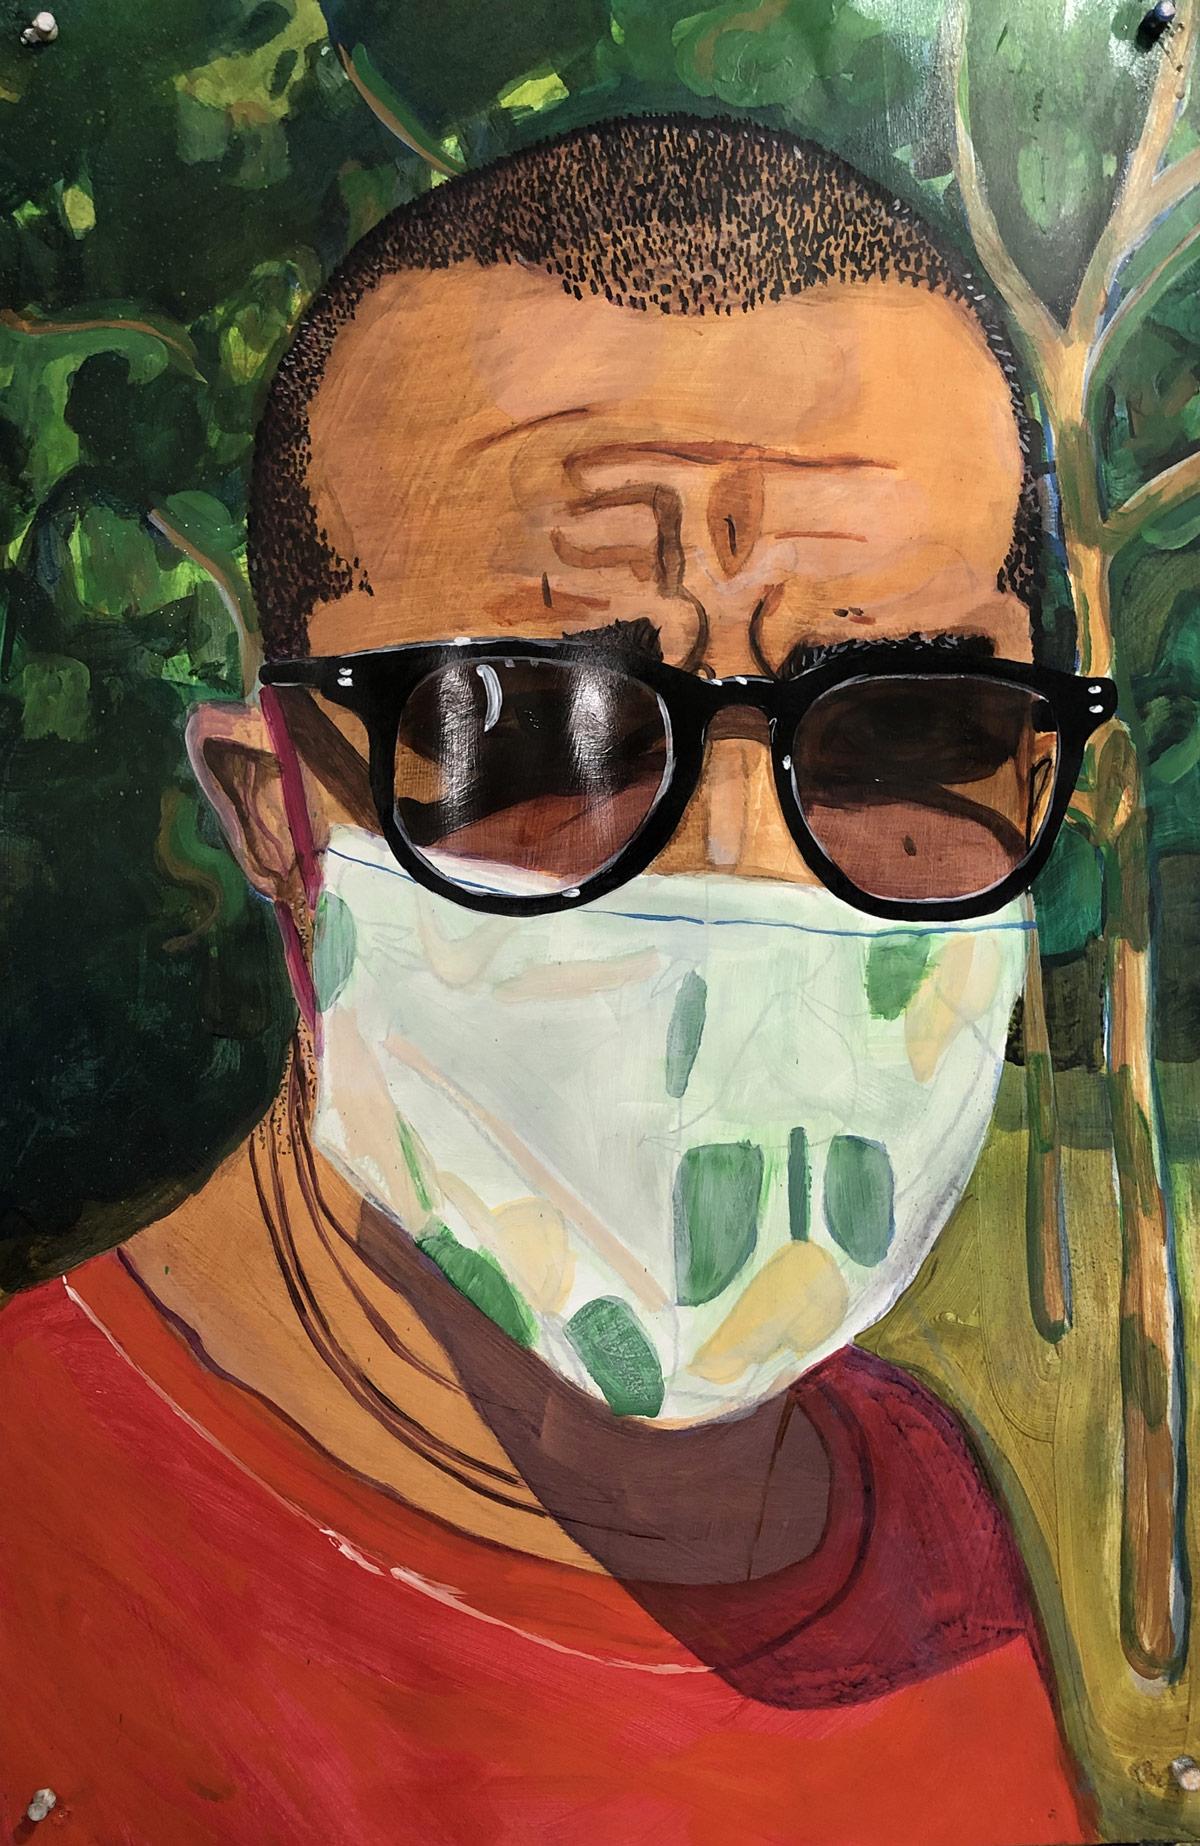 Shaun-Leonardo-artist-educator-New-York-NY-2020-acylic-on-paper-mounted-to-canvas-23.5-x-38